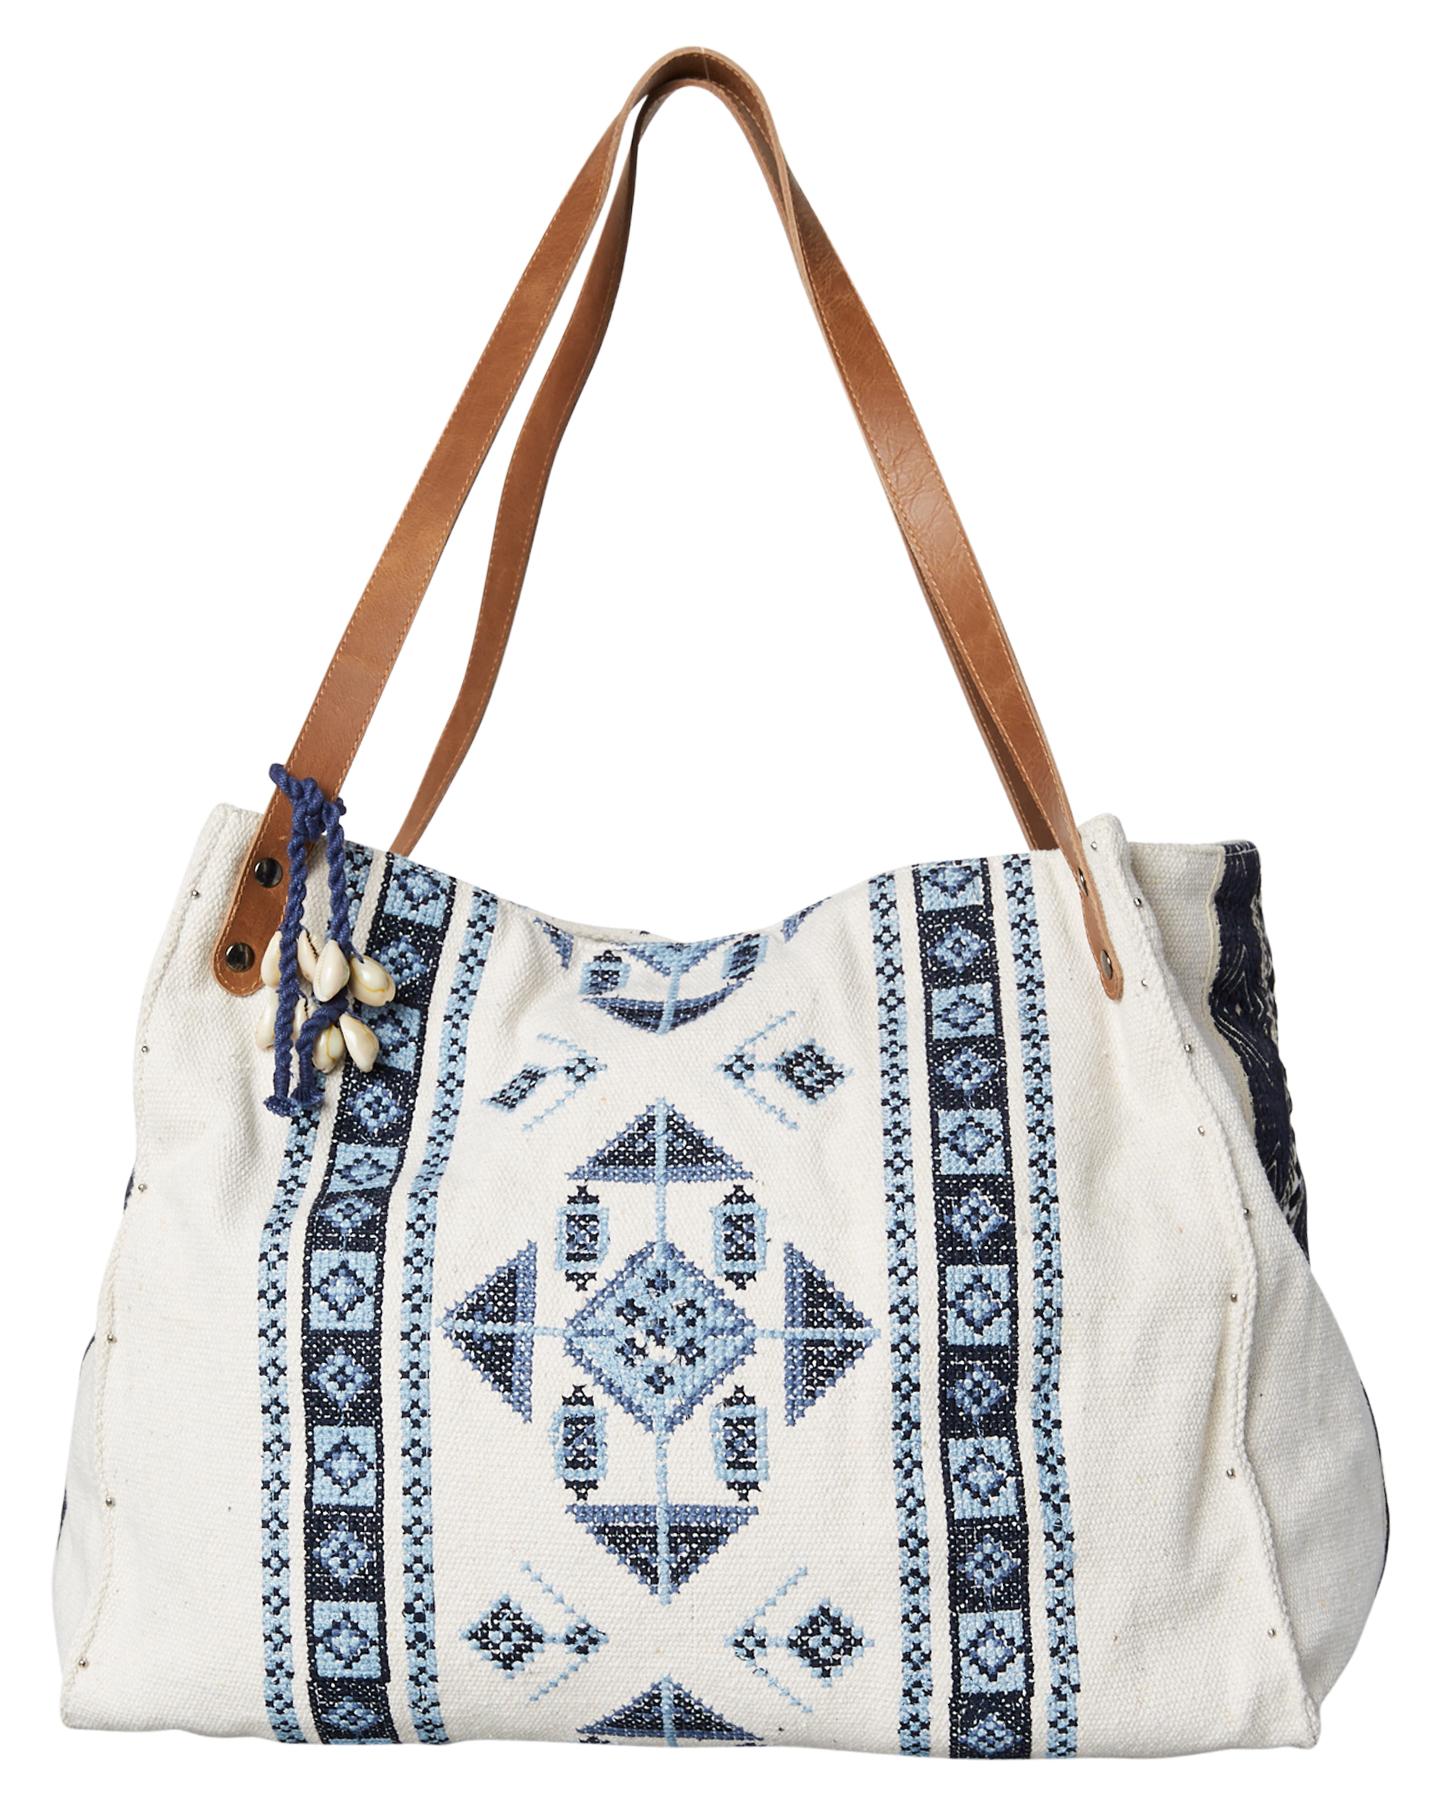 7ec09a343c8e Tigerlily Azar Bag White Womens leisure bags Size